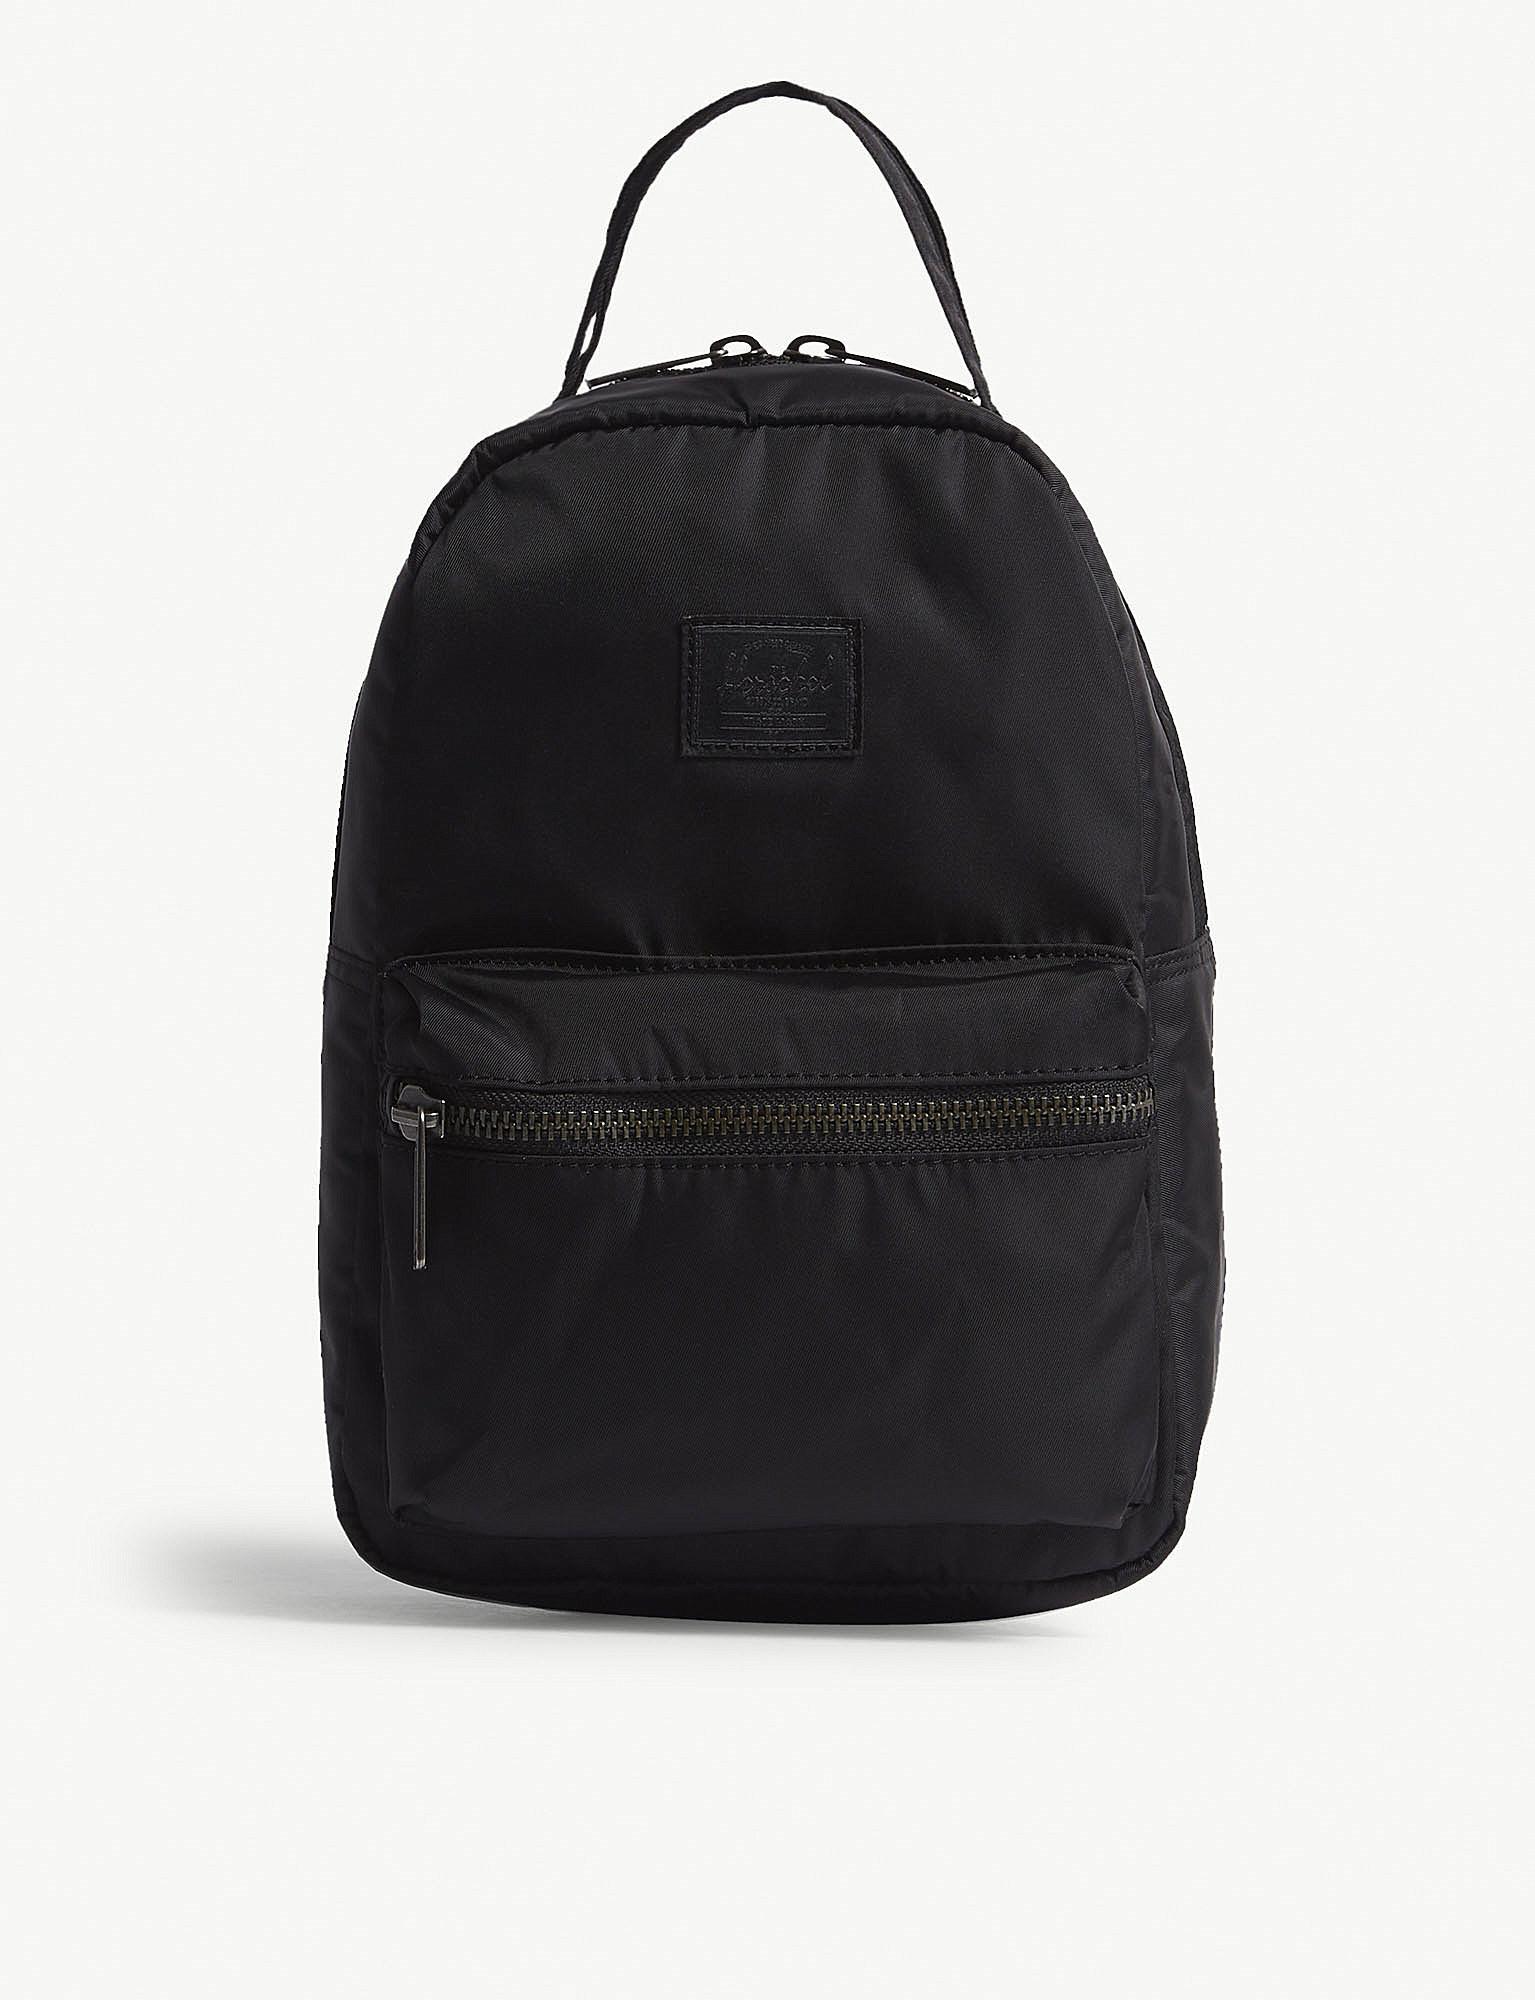 2ac080af9ff8 Herschel Backpack Black Gold Zipper- Fenix Toulouse Handball